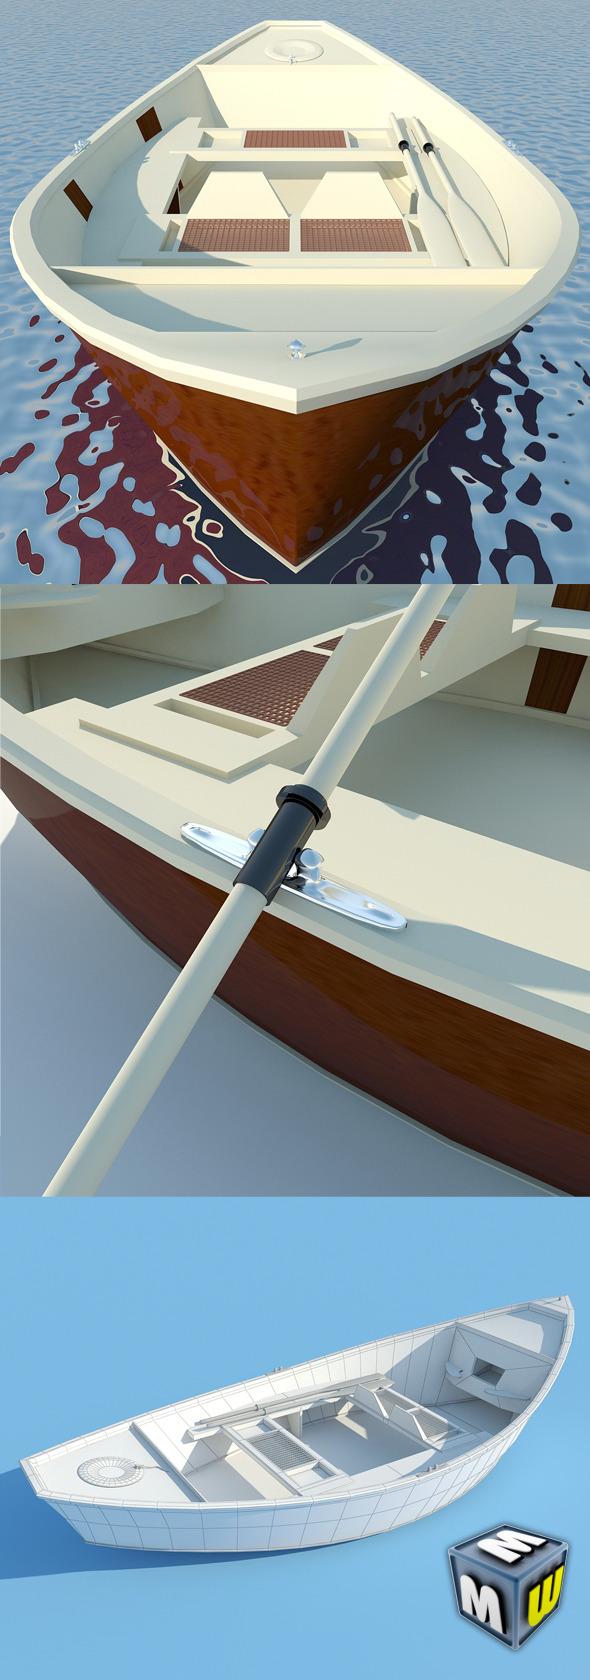 3DOcean Wooden Boat MAX 2011 5648822